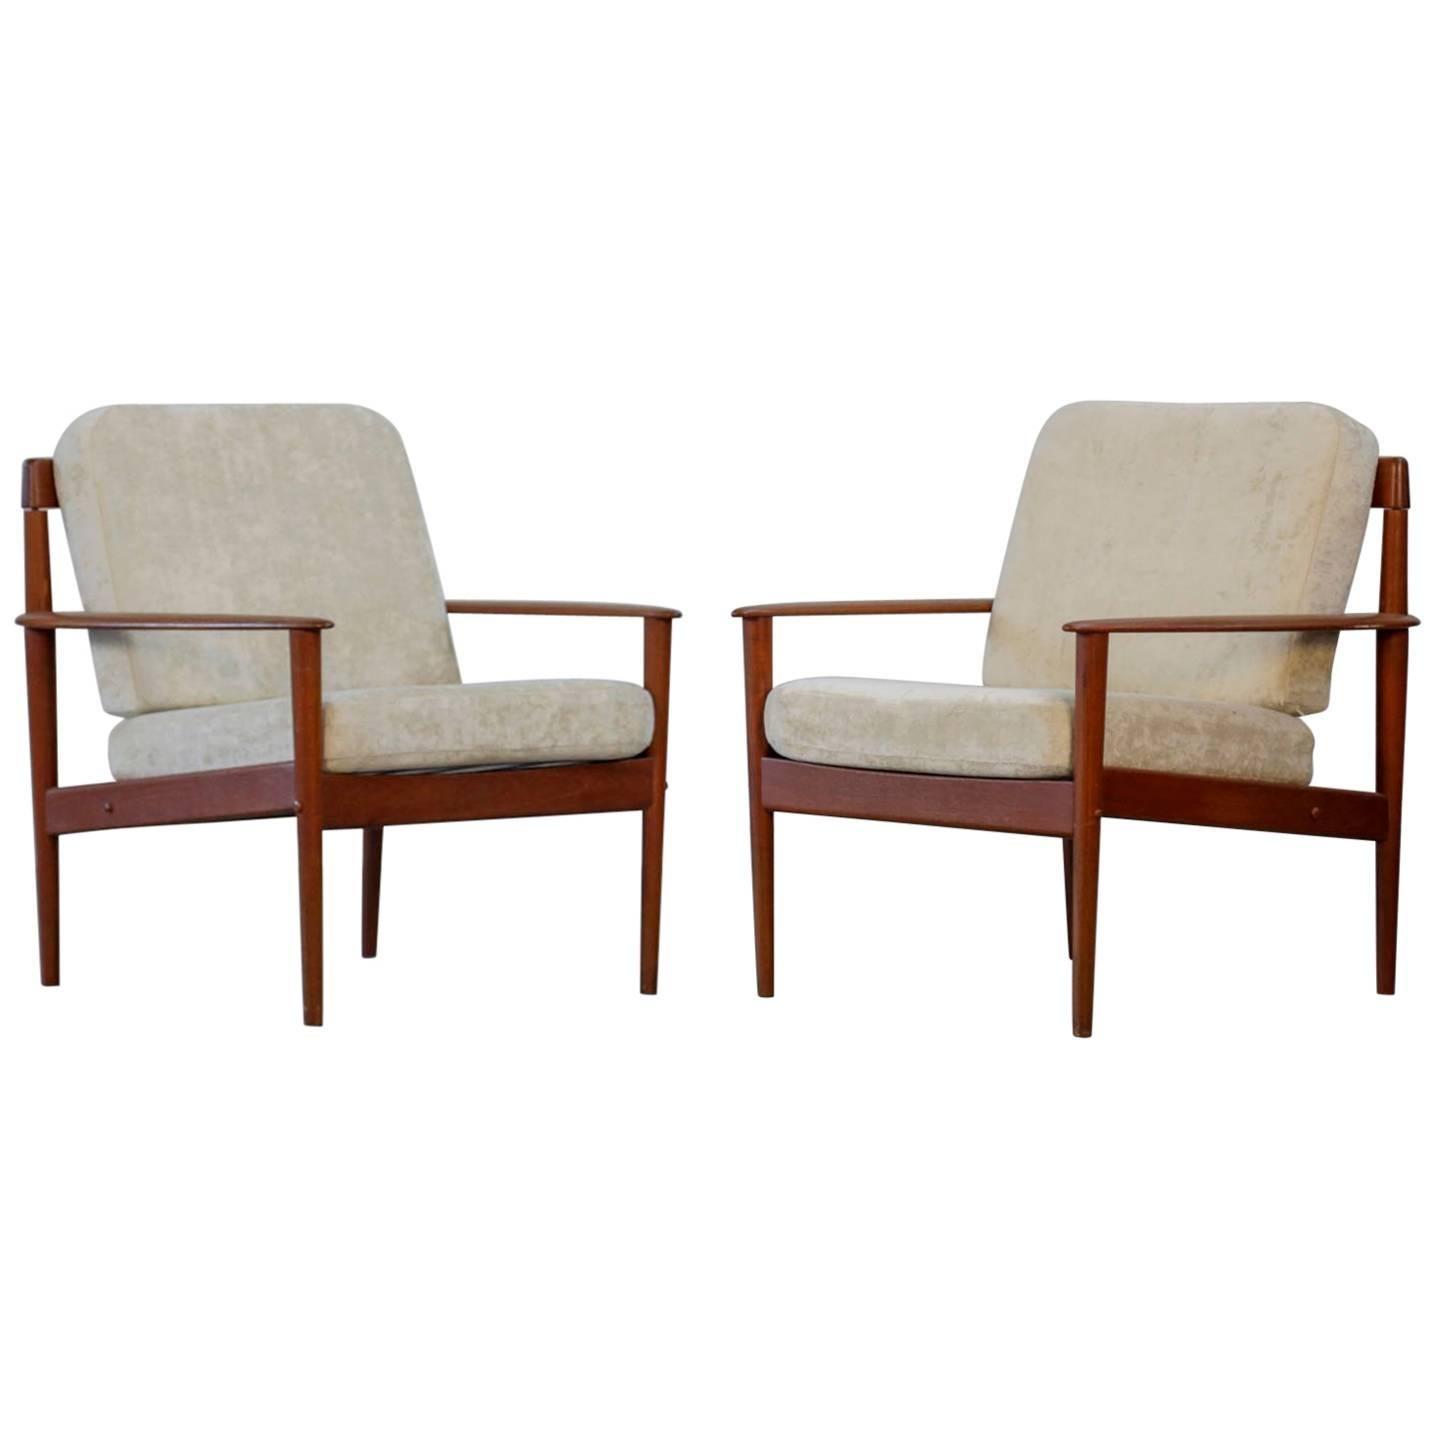 Pair of Lounge Chairs Grete Jalk Danish Teak, 1960s